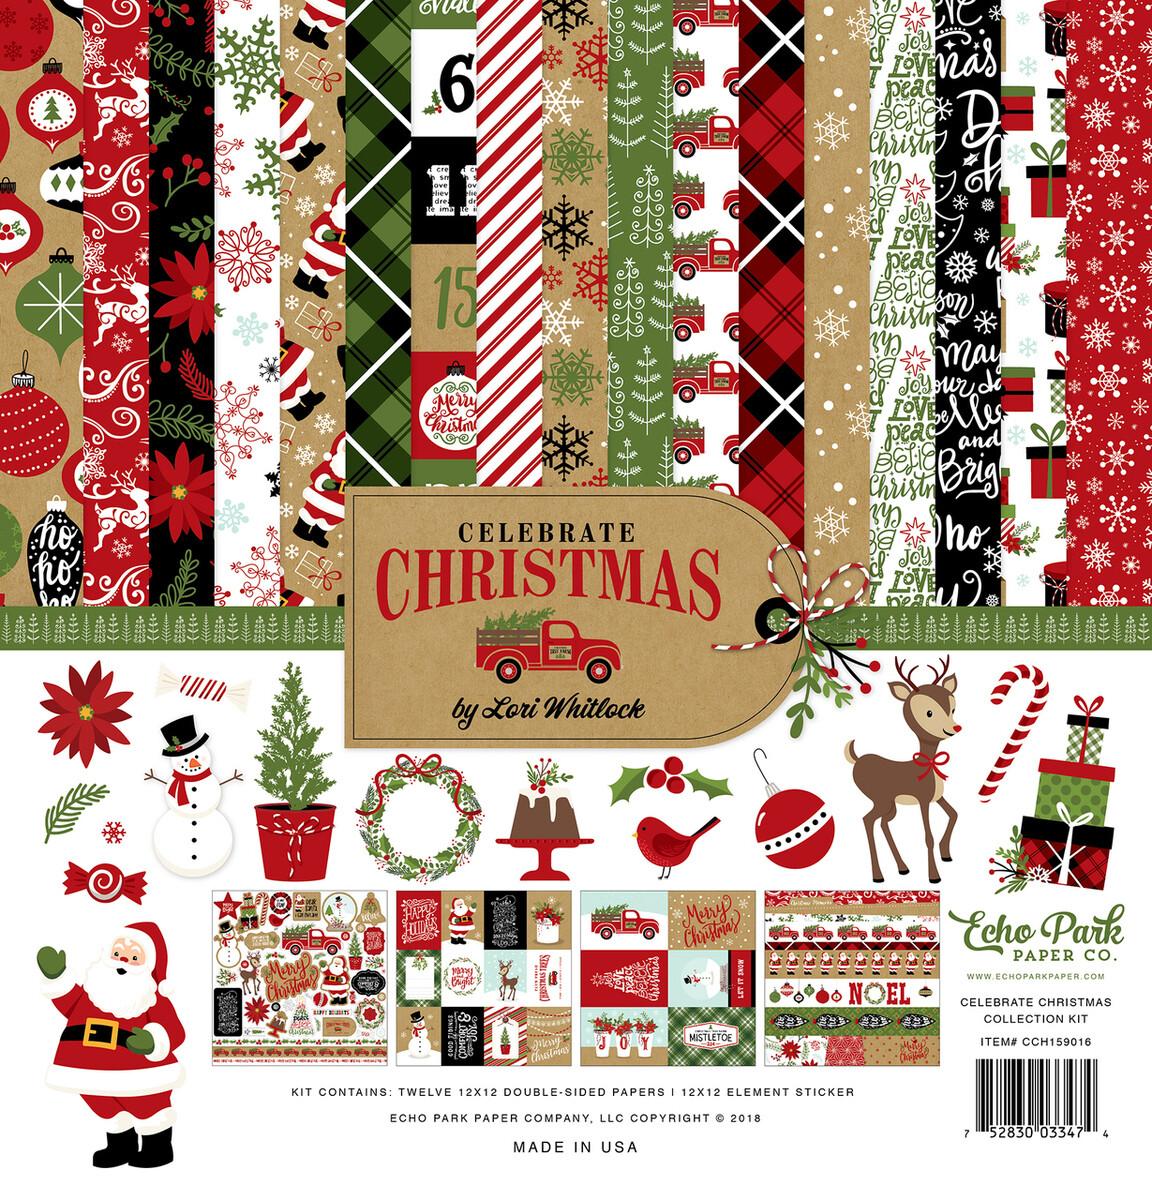 Echo Park Celebrate Christmas Collection Kit